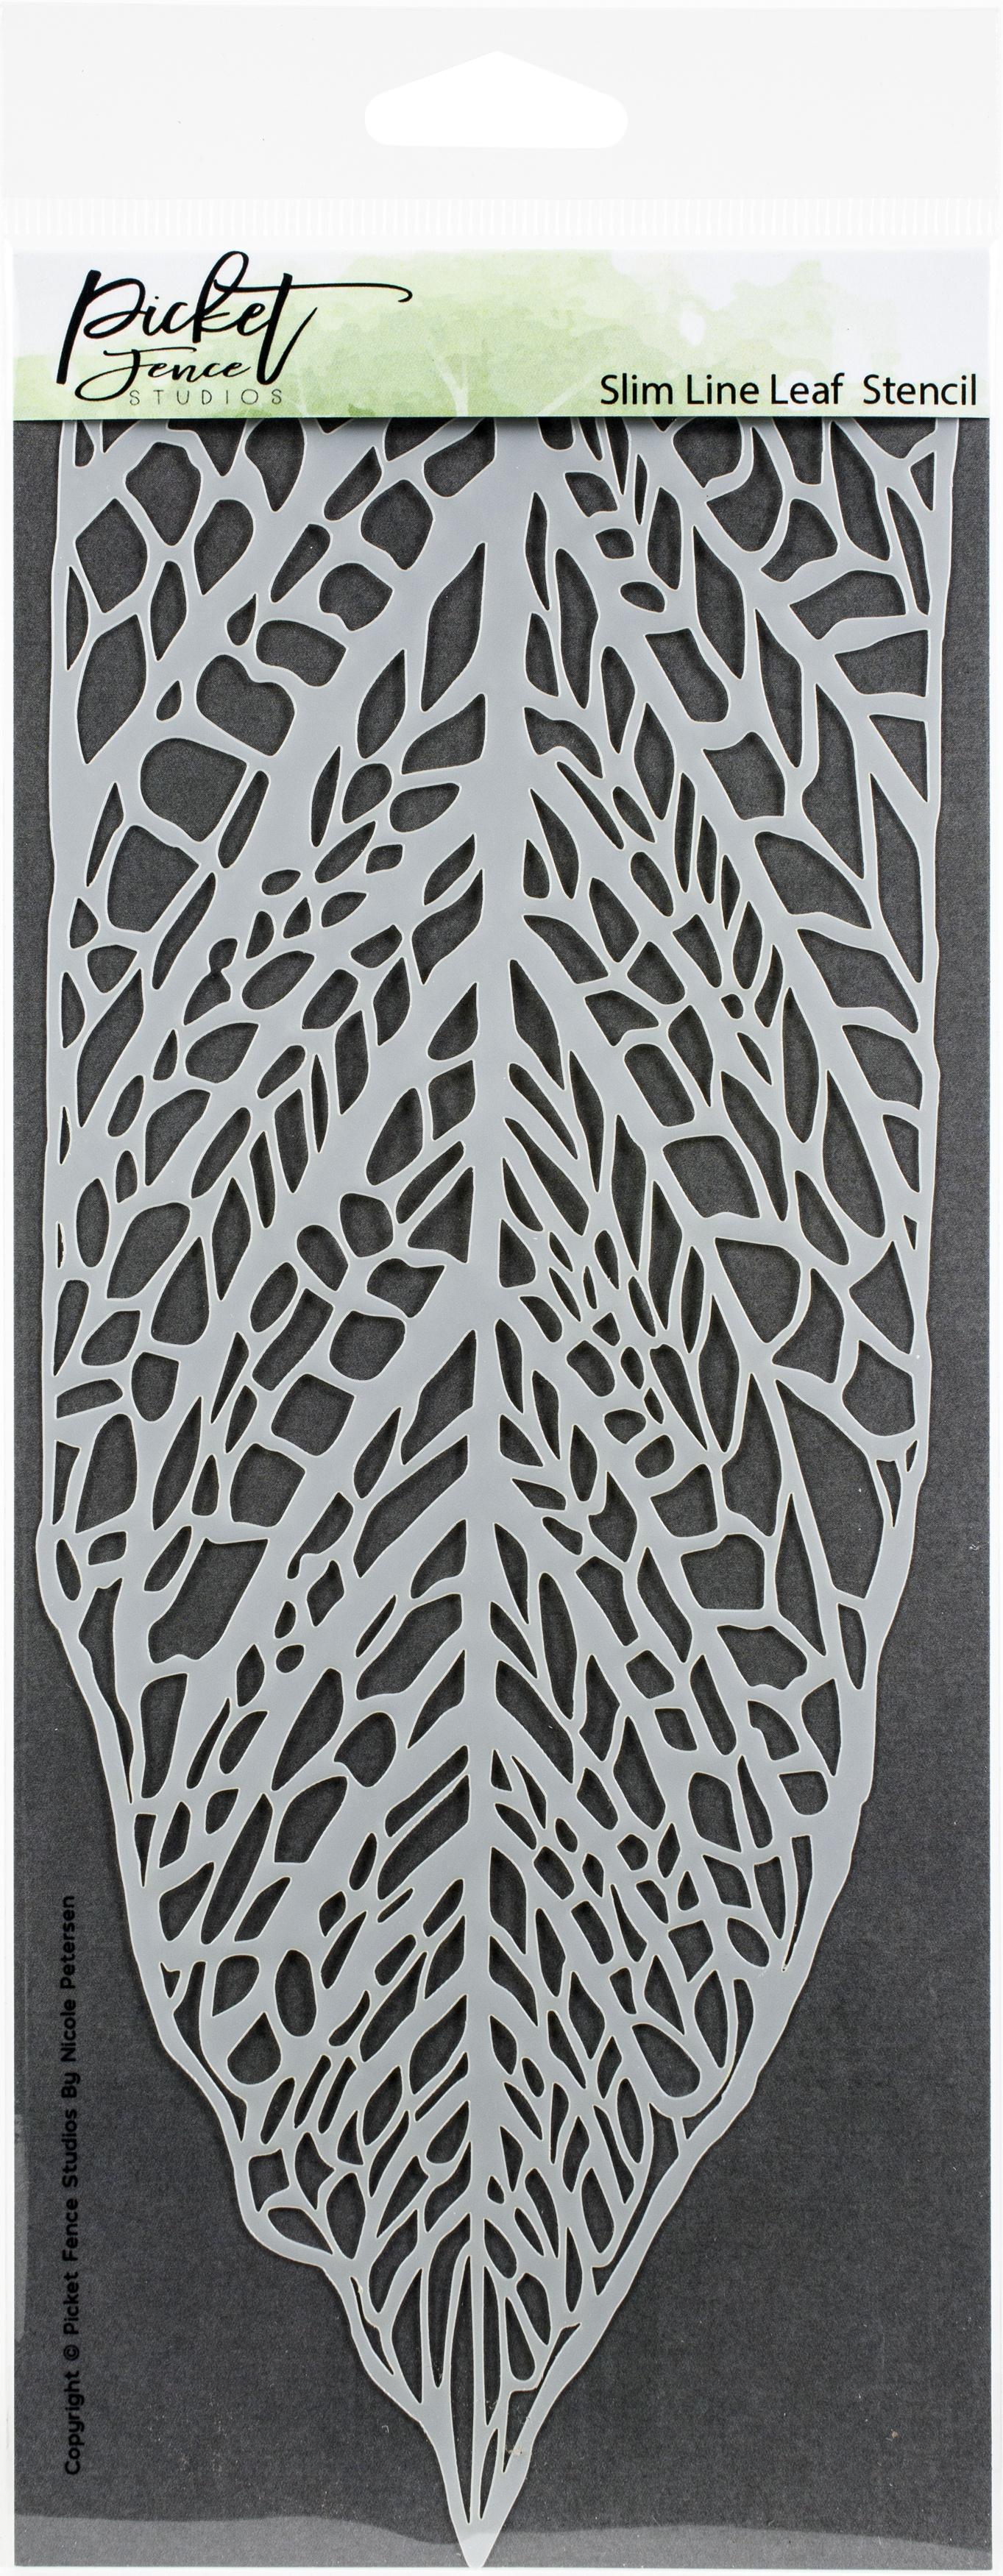 Picket Fence Studios Stencil 4X8-Slim Line Leaf